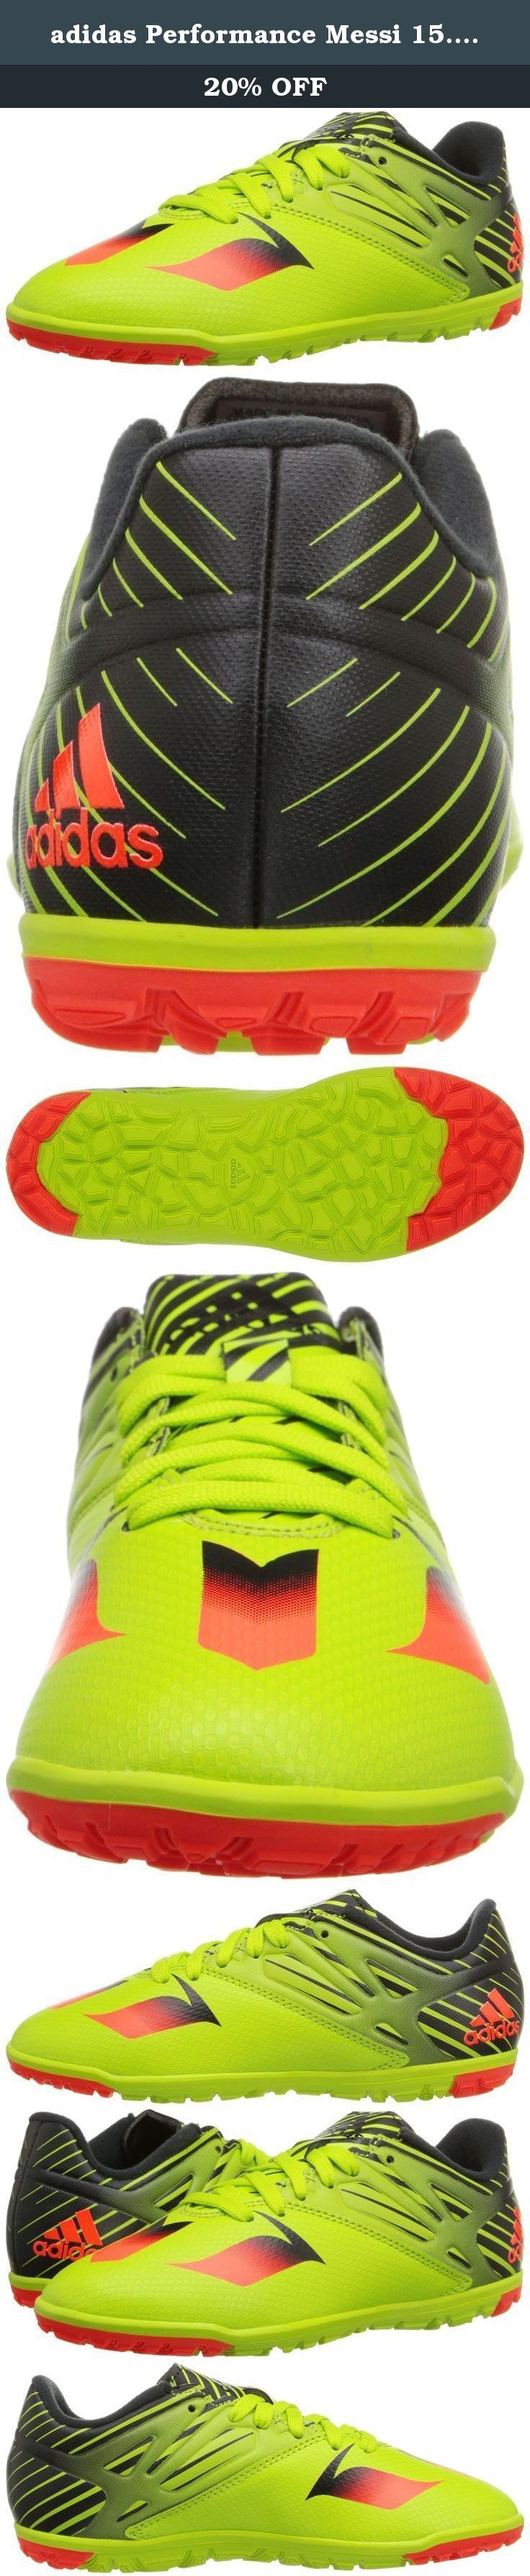 adidas Performance Messi 15.3 TF J Soccer Shoe (Little Kid/Big Kid), Semi Solar Slime/Solar Red/Black, 4 M US Big Kid. Kids Soccer Shoe.